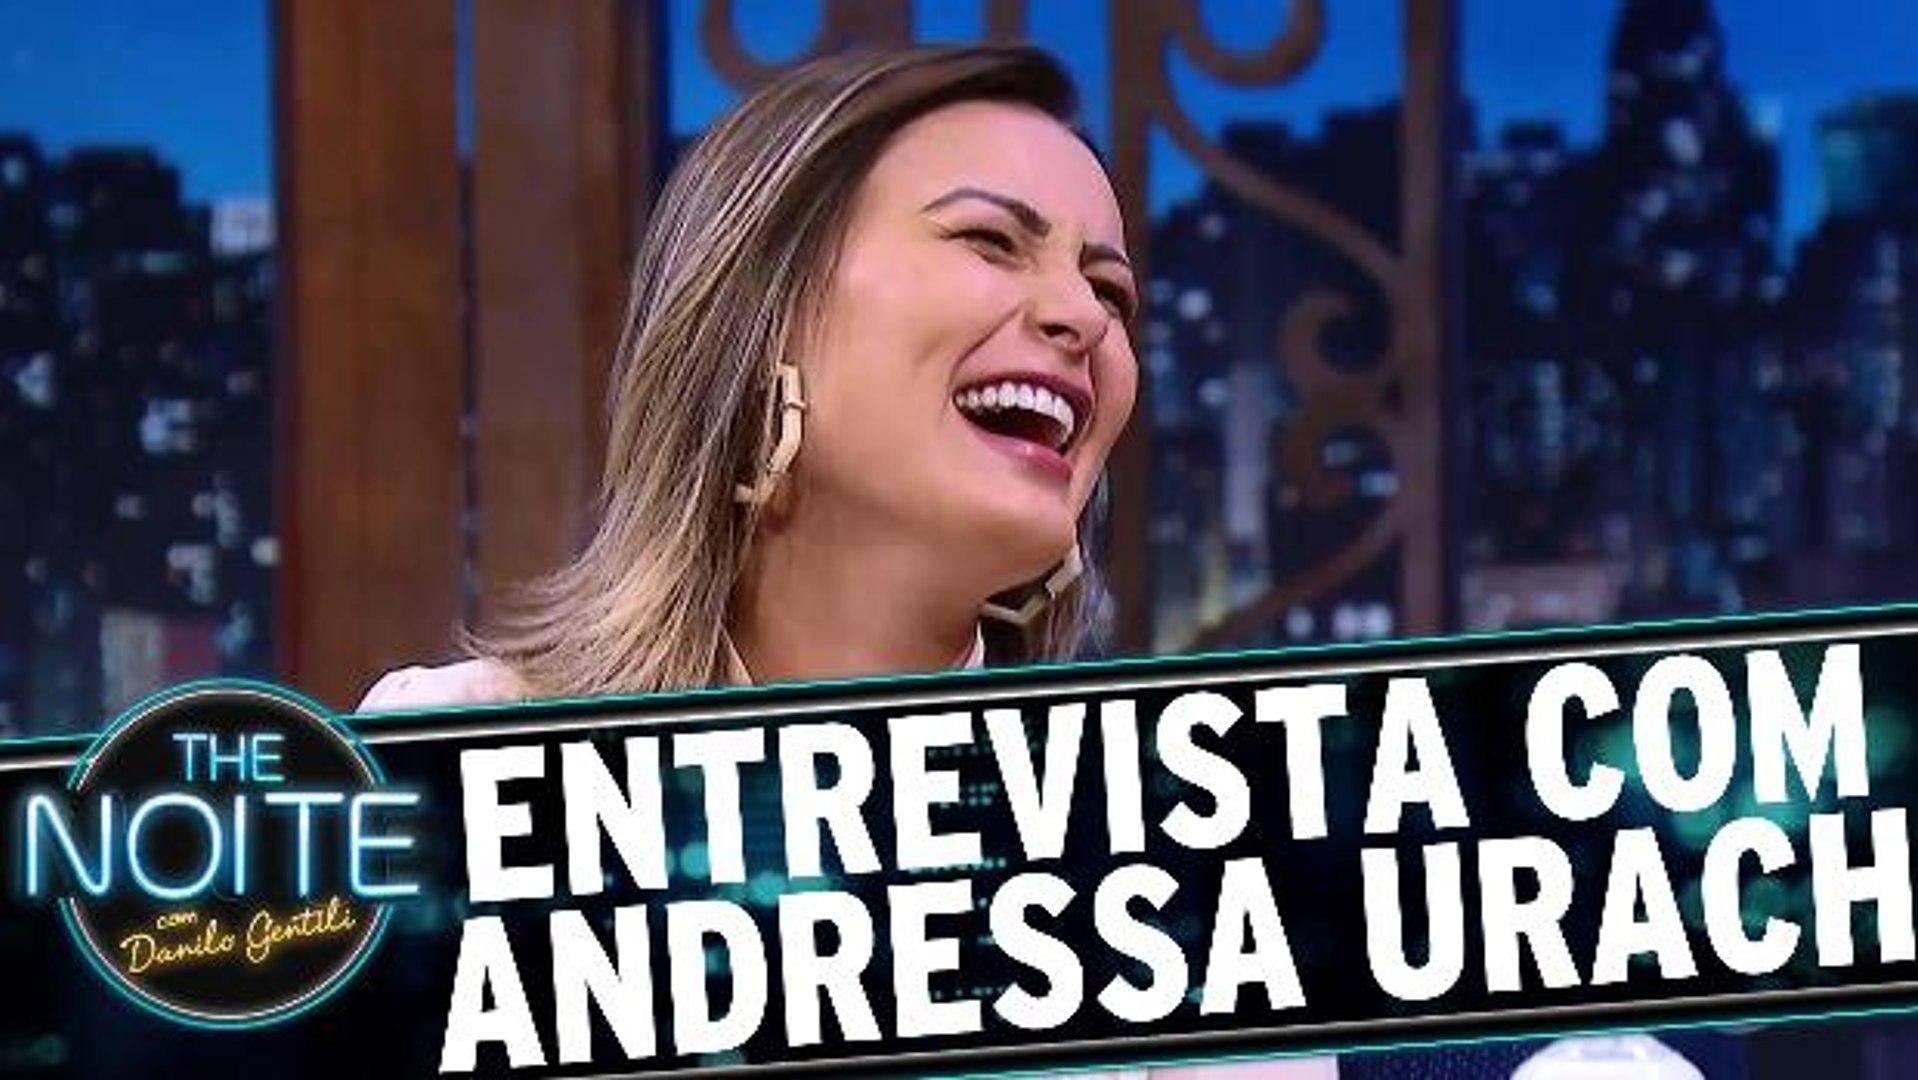 Andressa Urach Video Nua entrevista com andressa urach